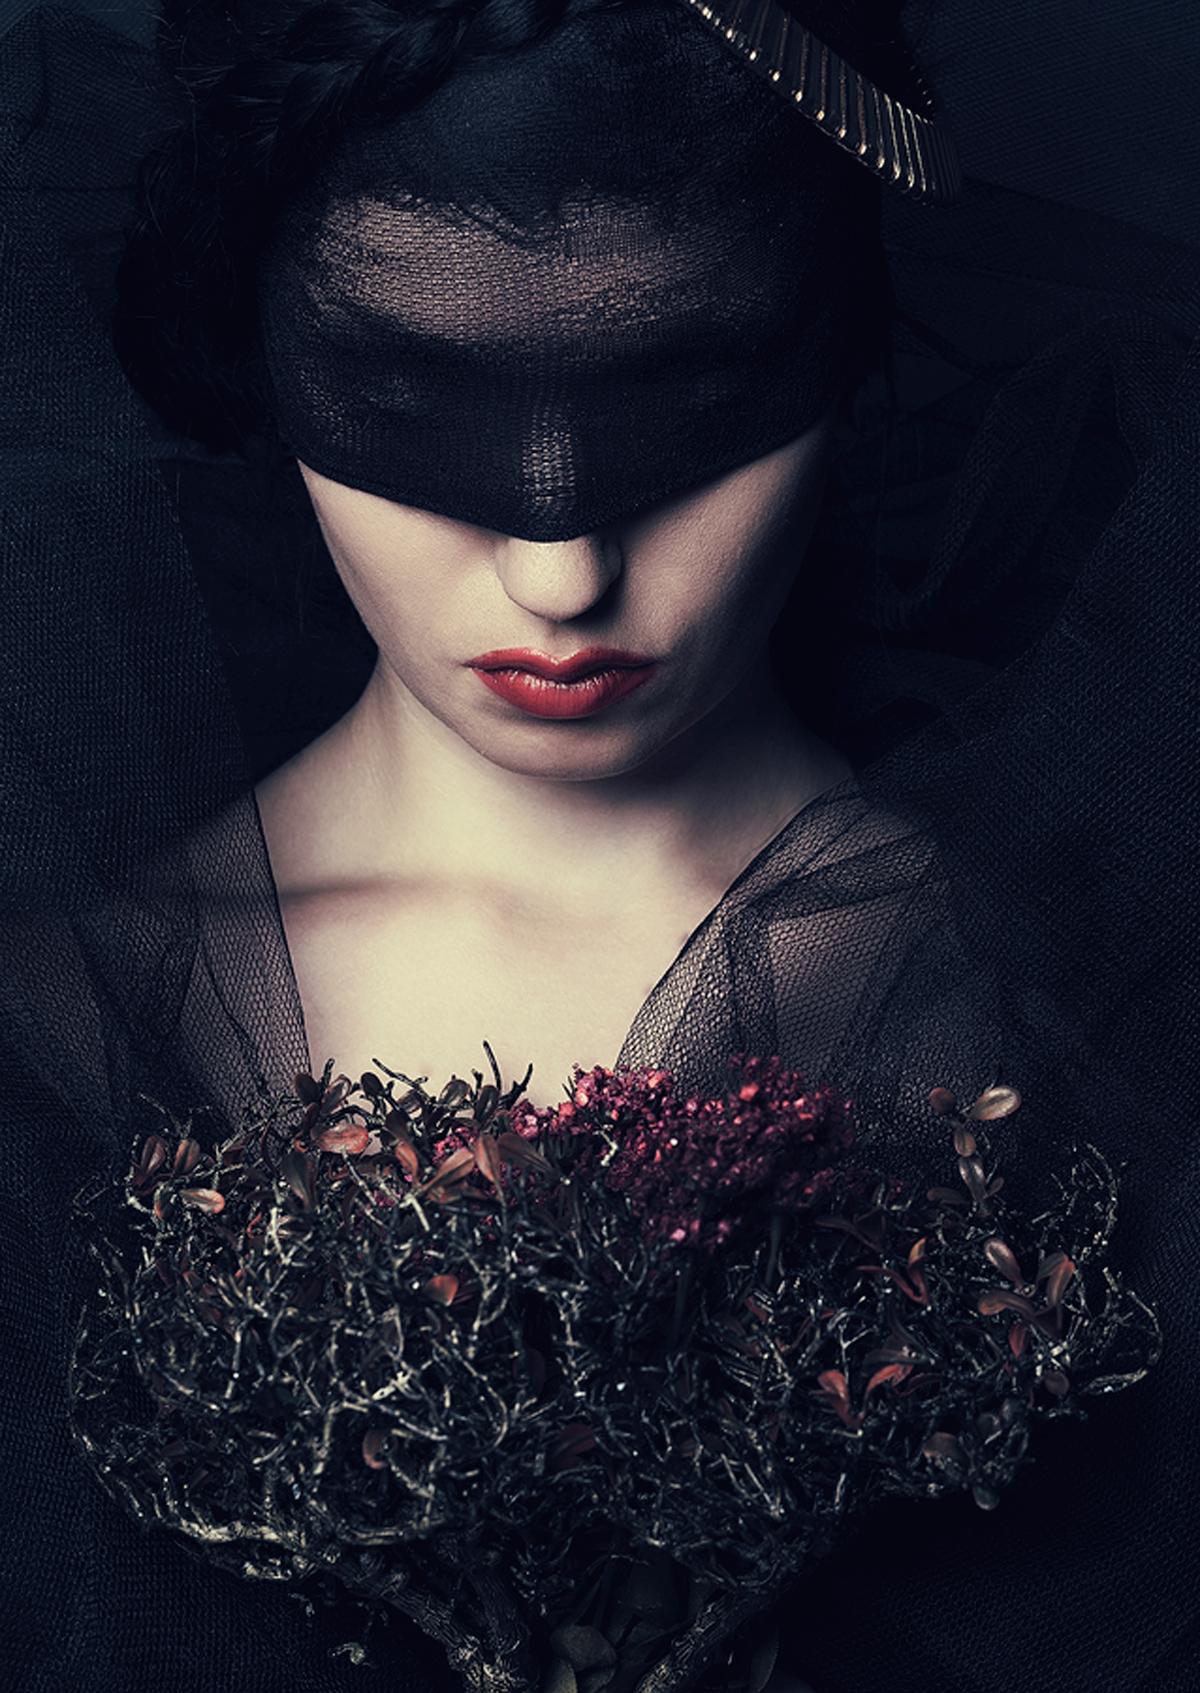 Makeup Photography: Dark BeautyDark Beauty